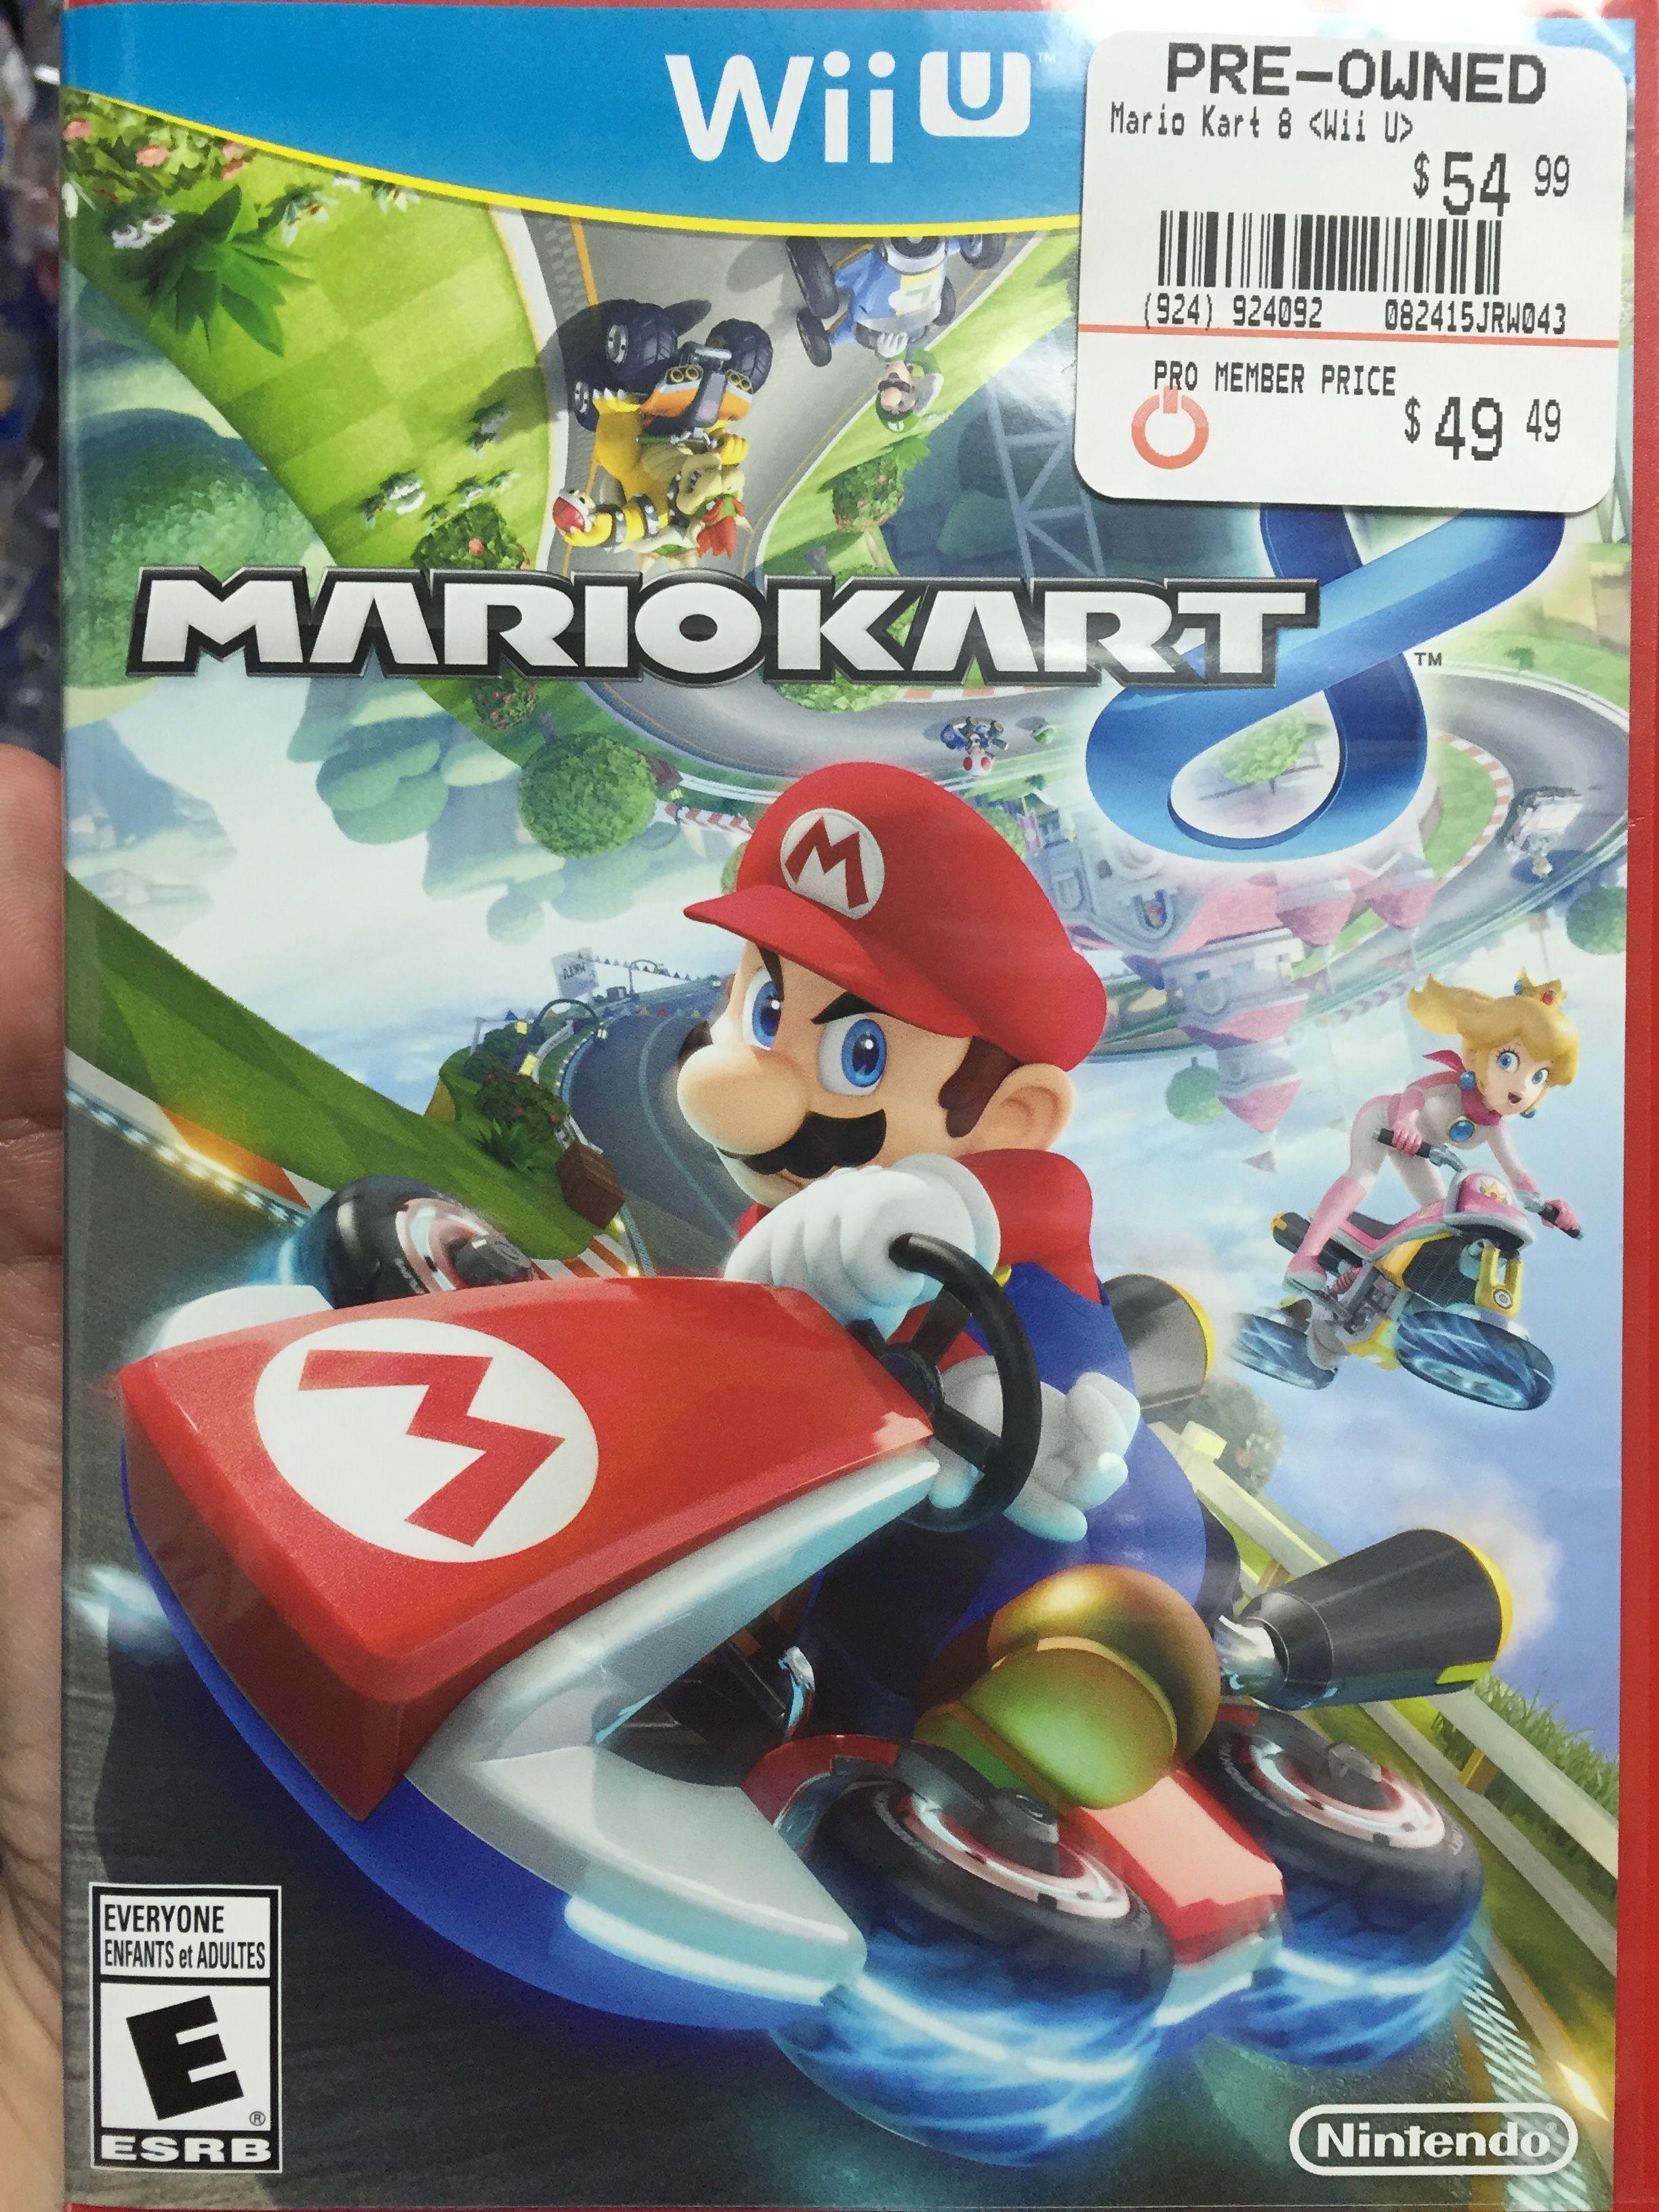 Mario Kart 8 Gamestop Wii U Games Mario Kart Mario Kart 8